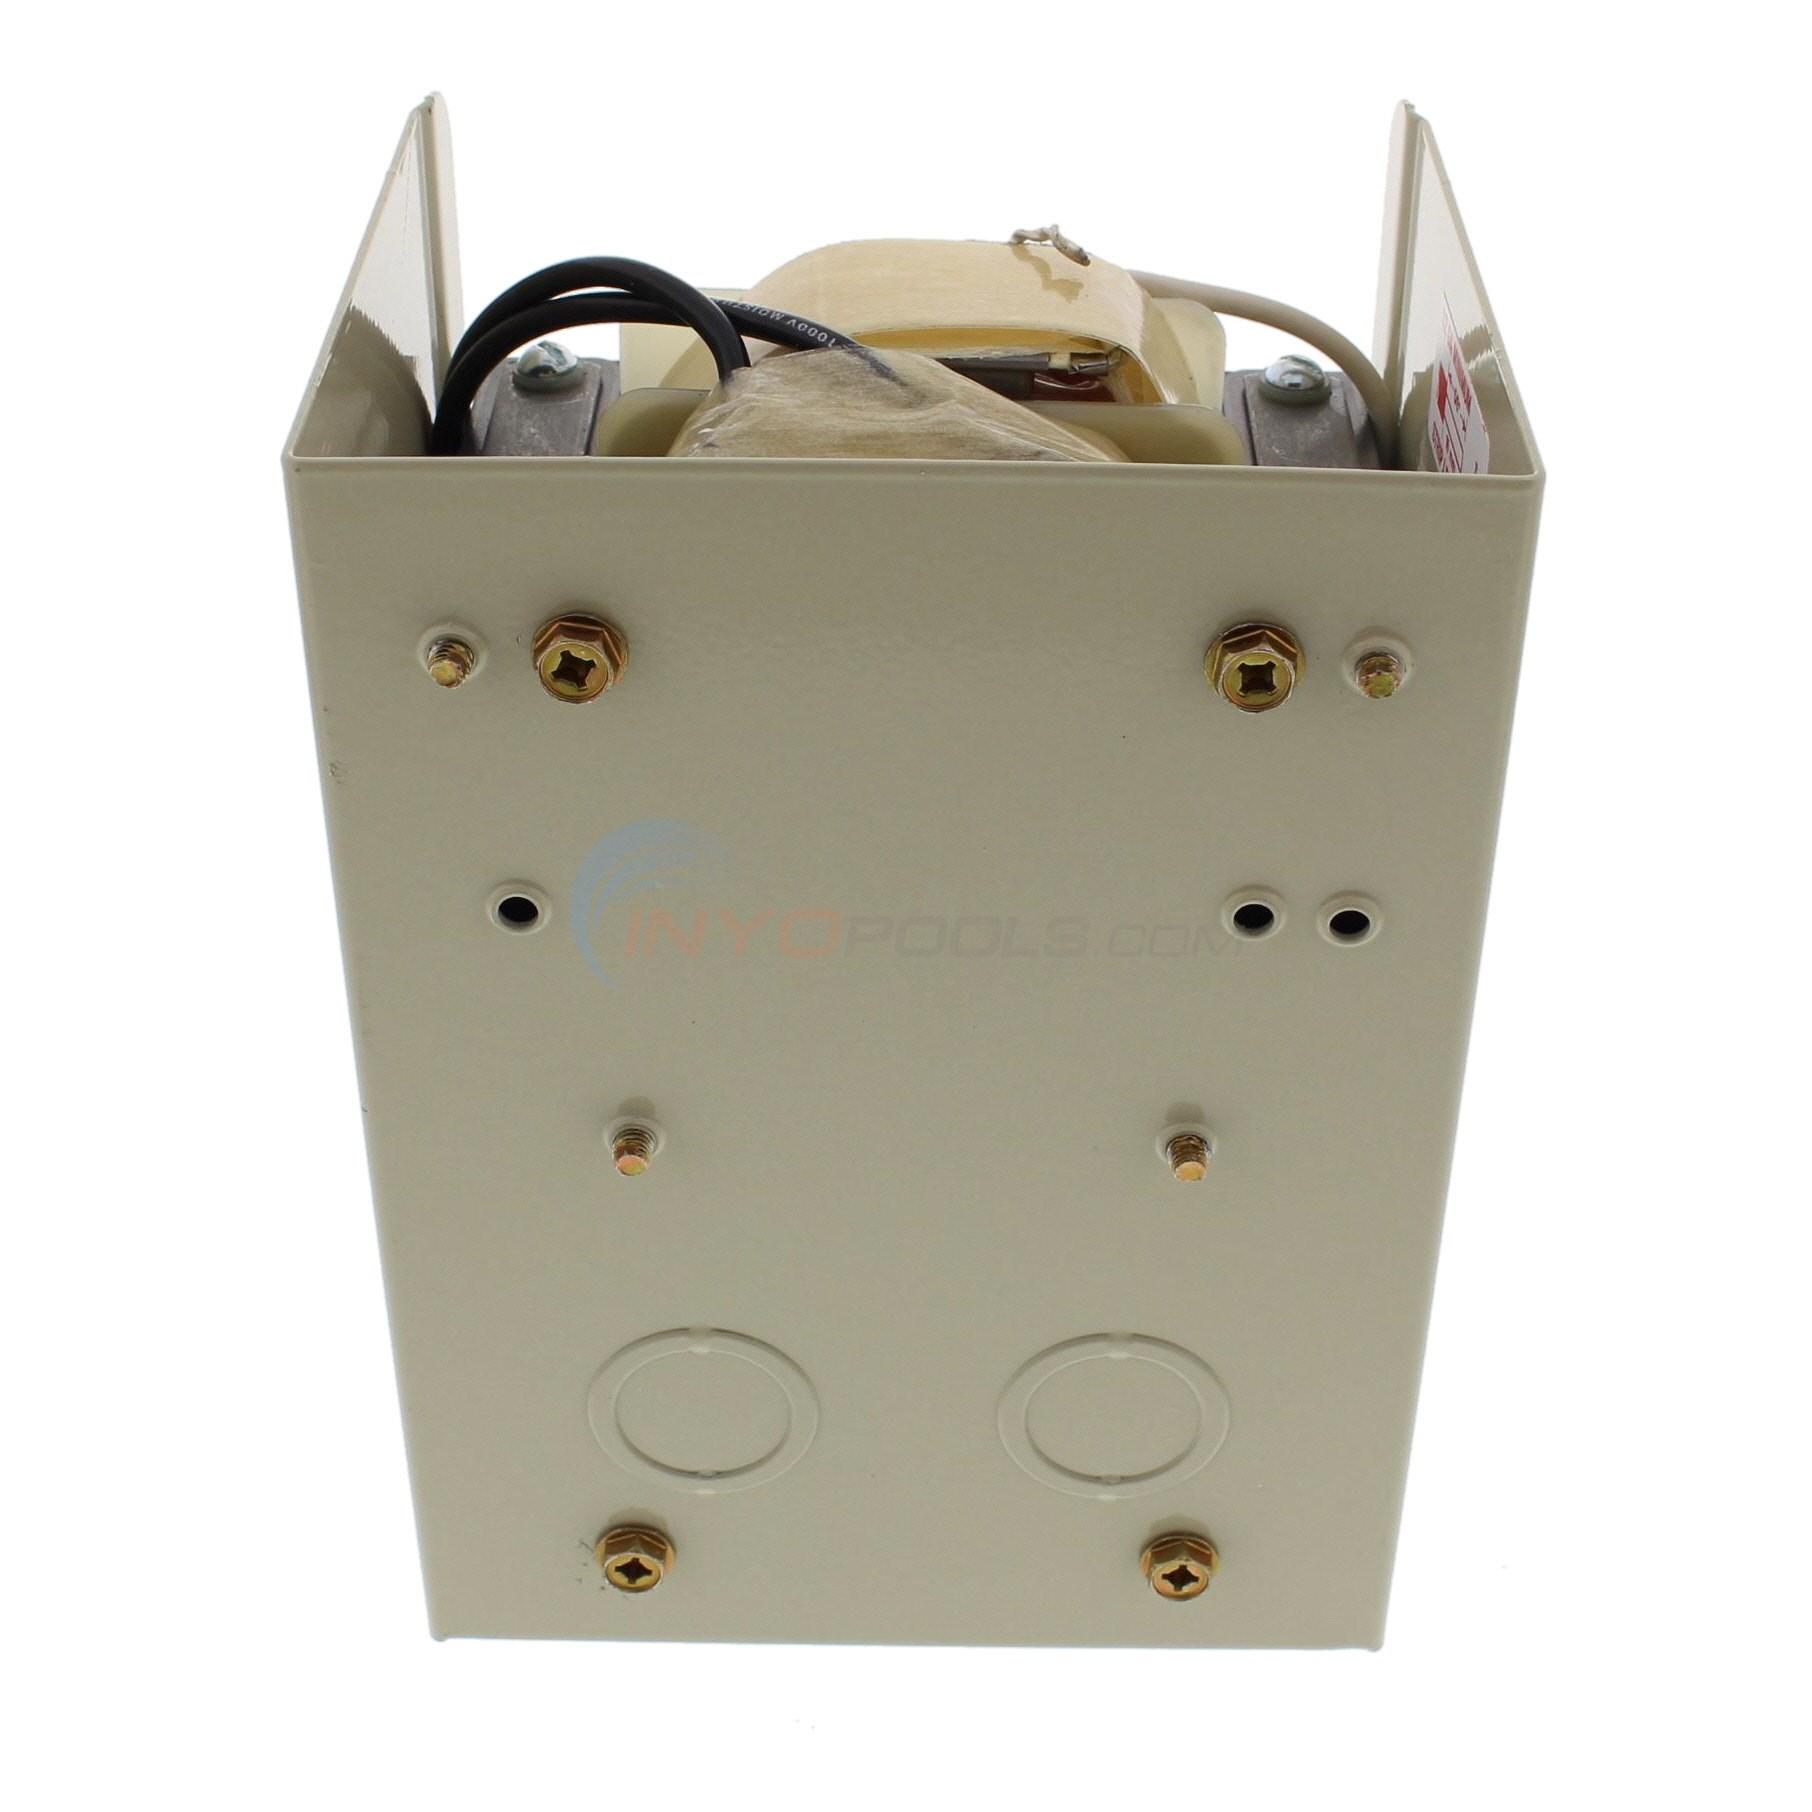 Install 480v Transformer Wiring Diagram 12v - Www.toyskids.co • on 480v transformer wiring diagram, 240v transformer diagram, 480v to 240v step-up transformers,